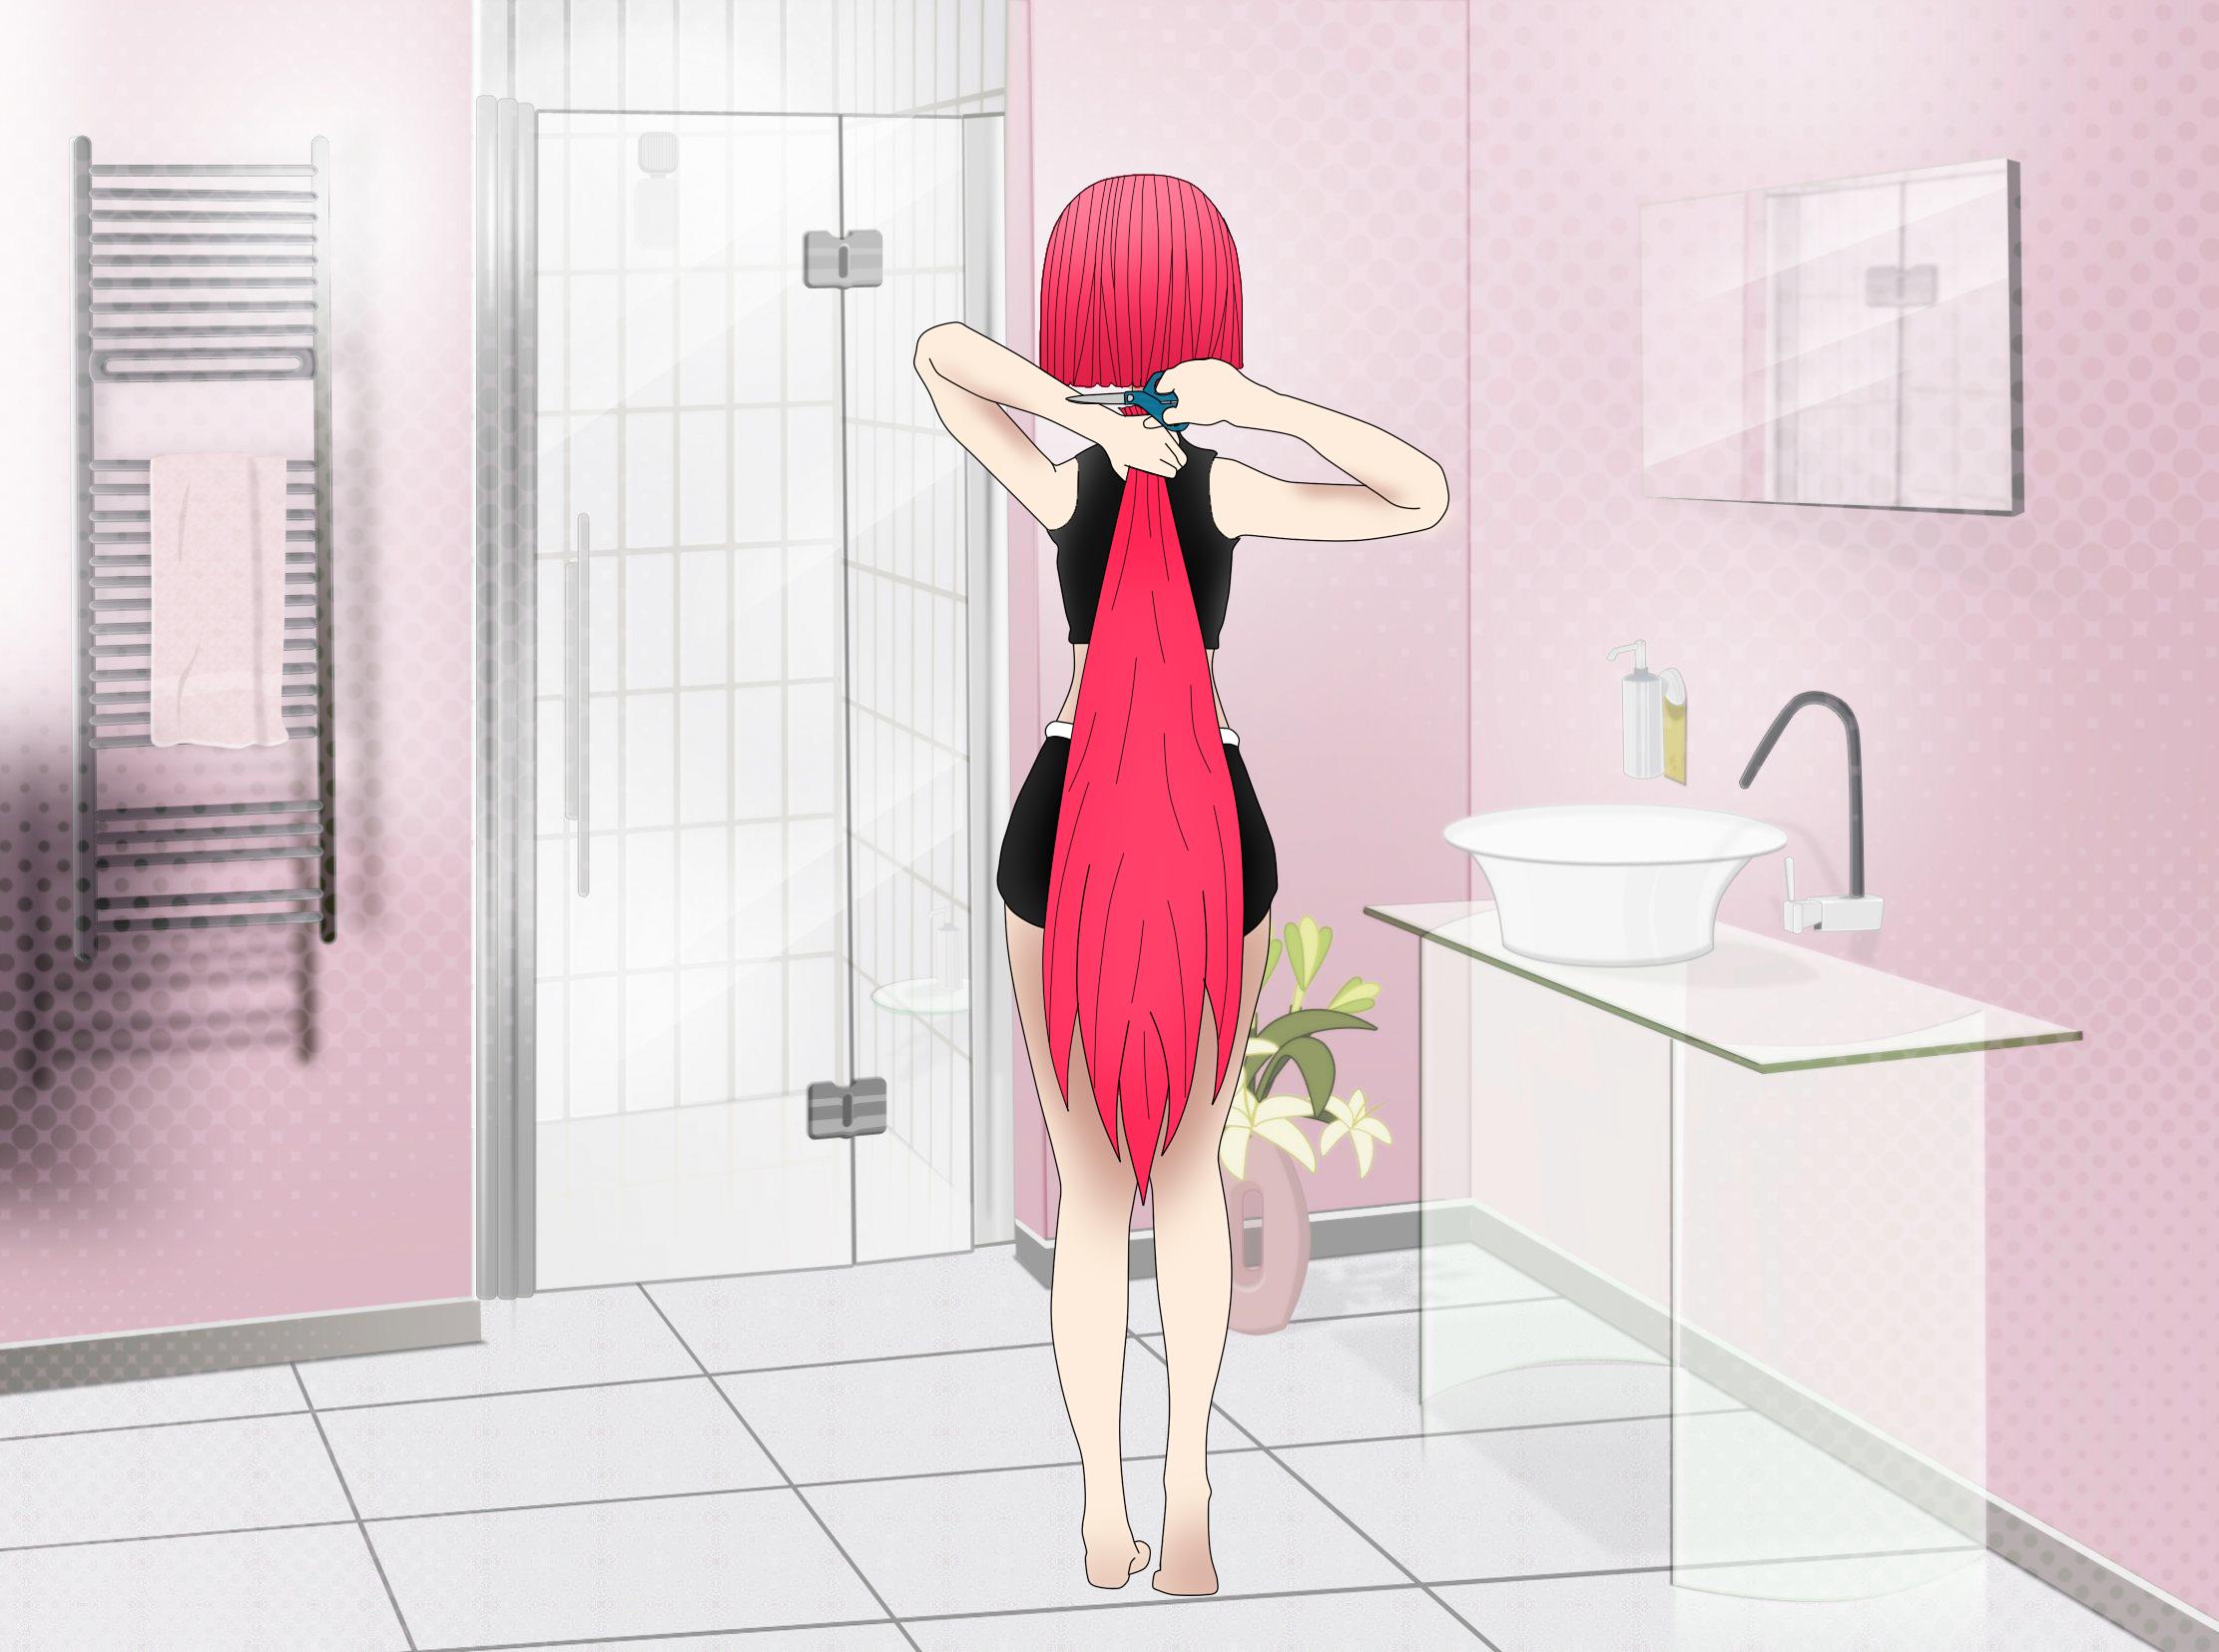 Anime Girl Haircut 4 By Ropa111 On Deviantart